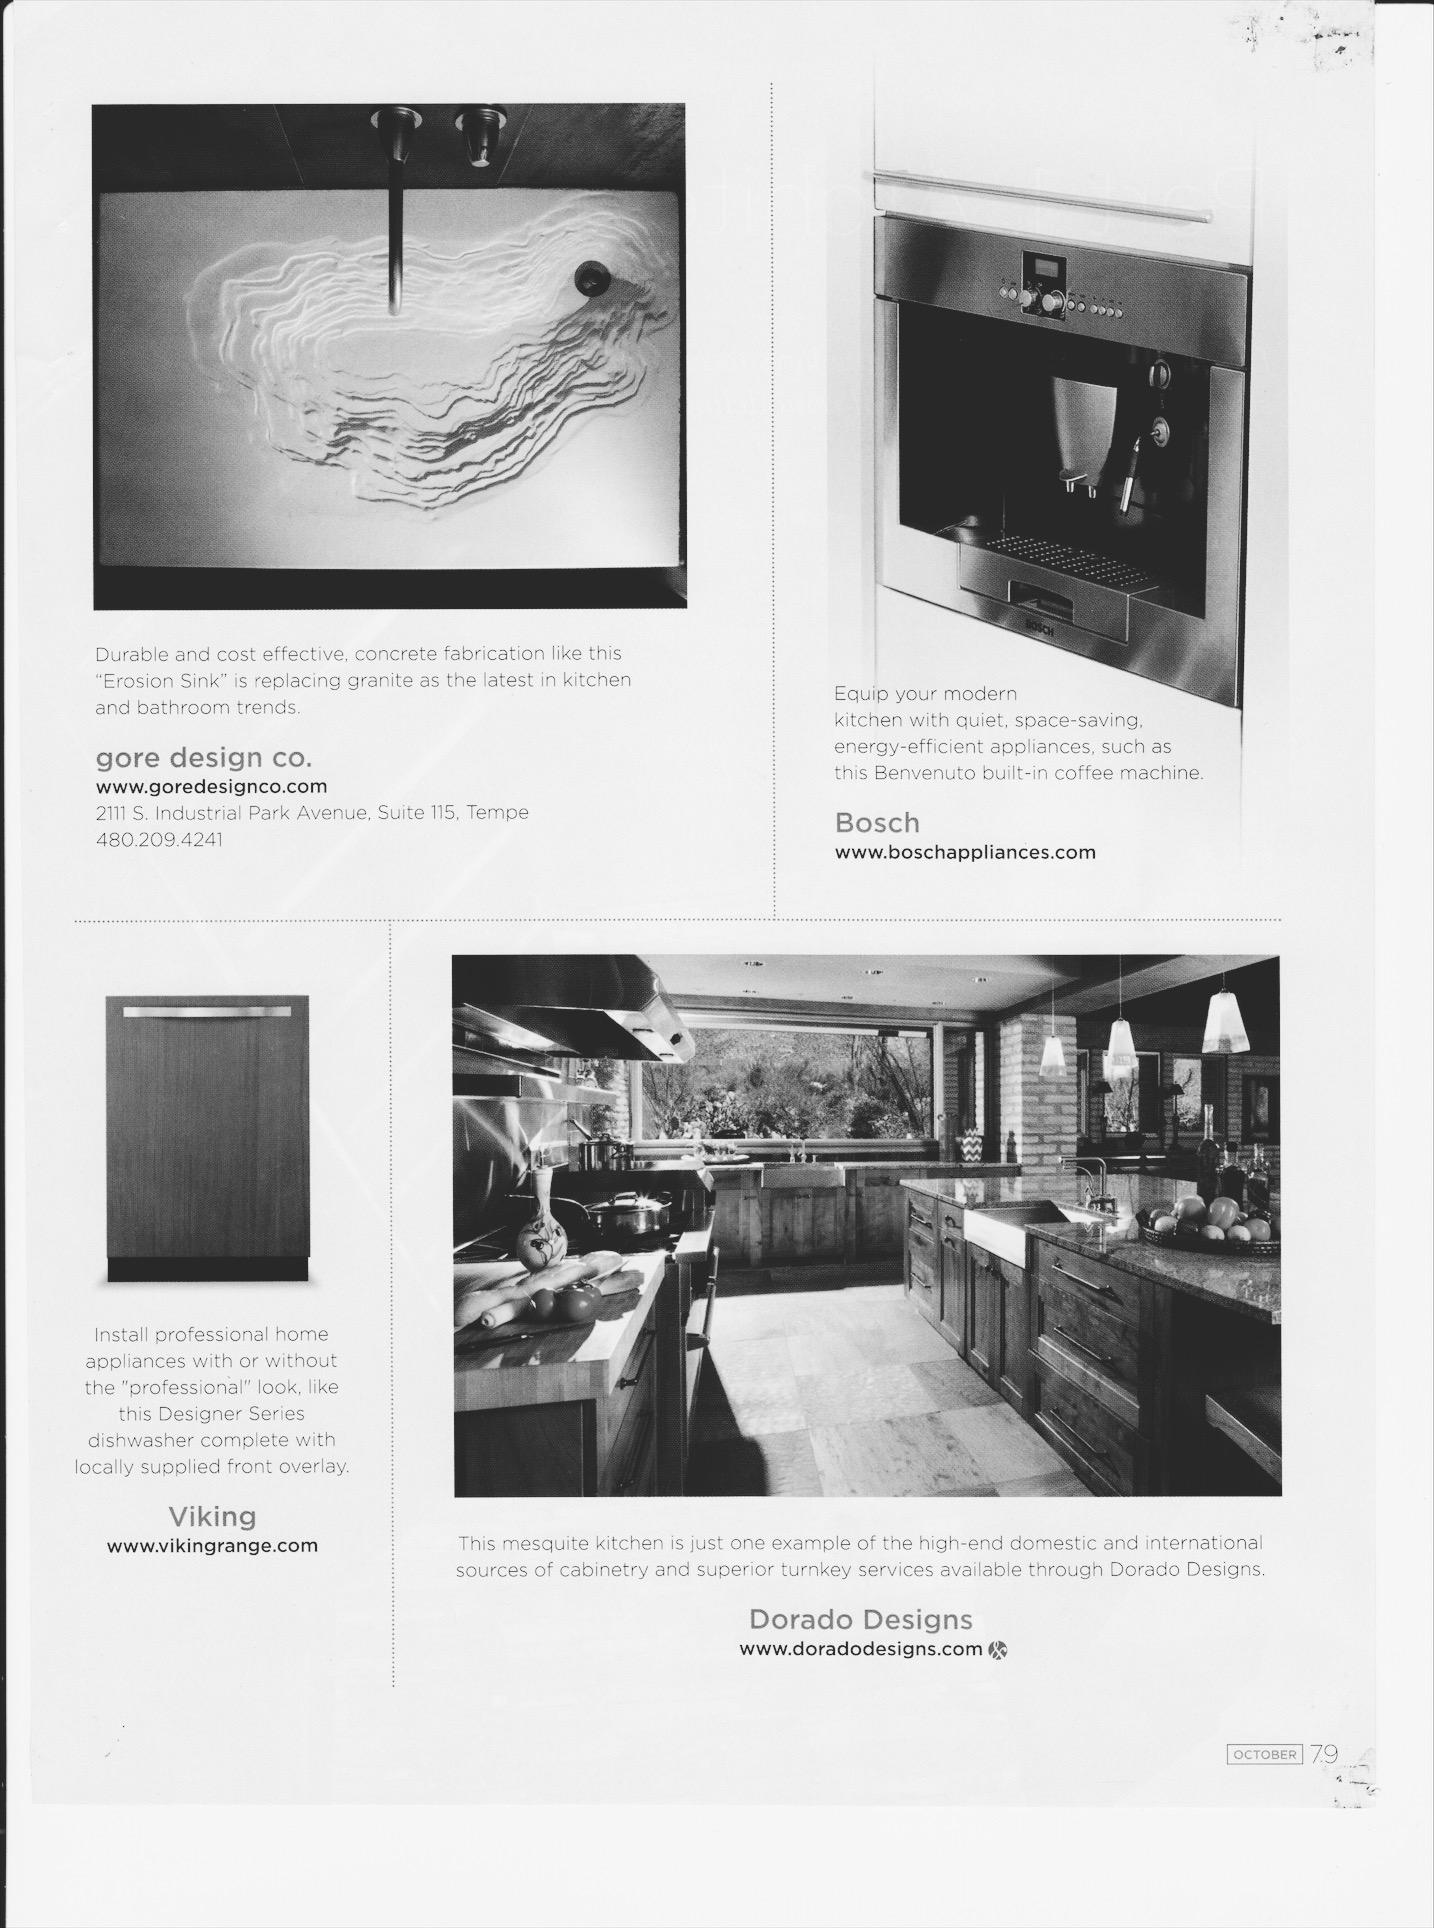 brandon-gore-print-publications-concrete-7081 2.JPG